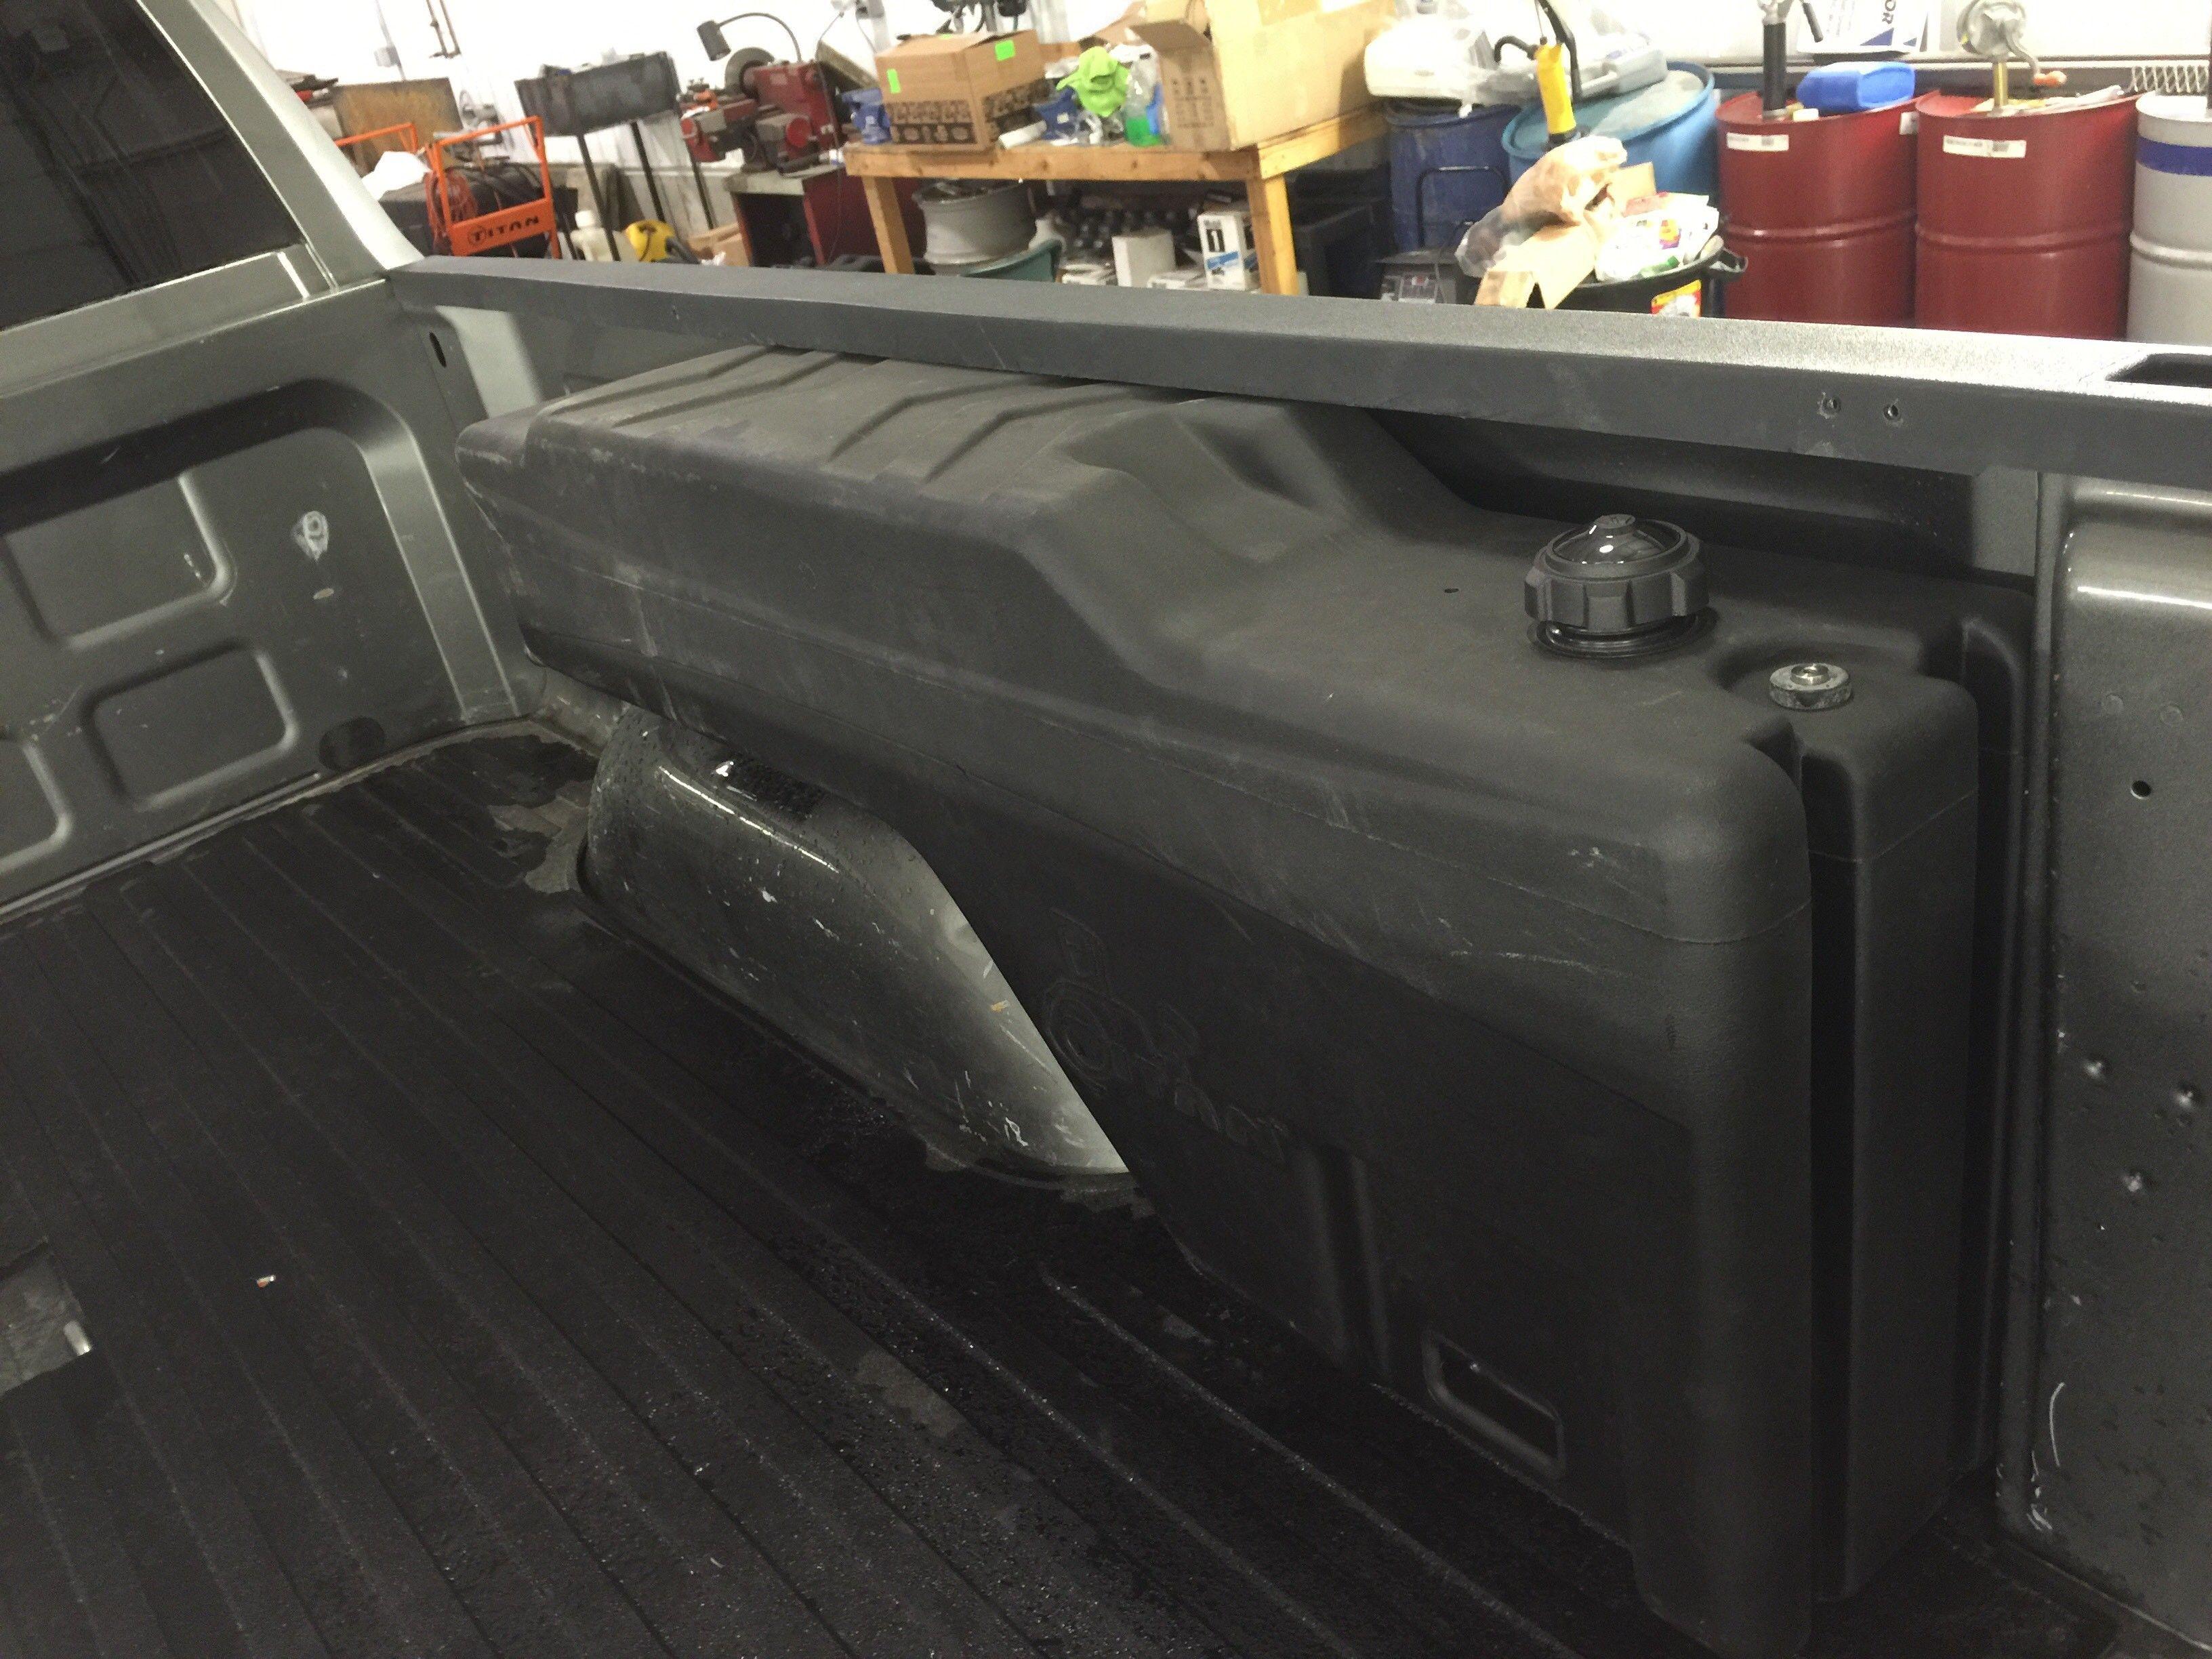 titan sidekick 15 gal portable liquid tank 5040015. Black Bedroom Furniture Sets. Home Design Ideas